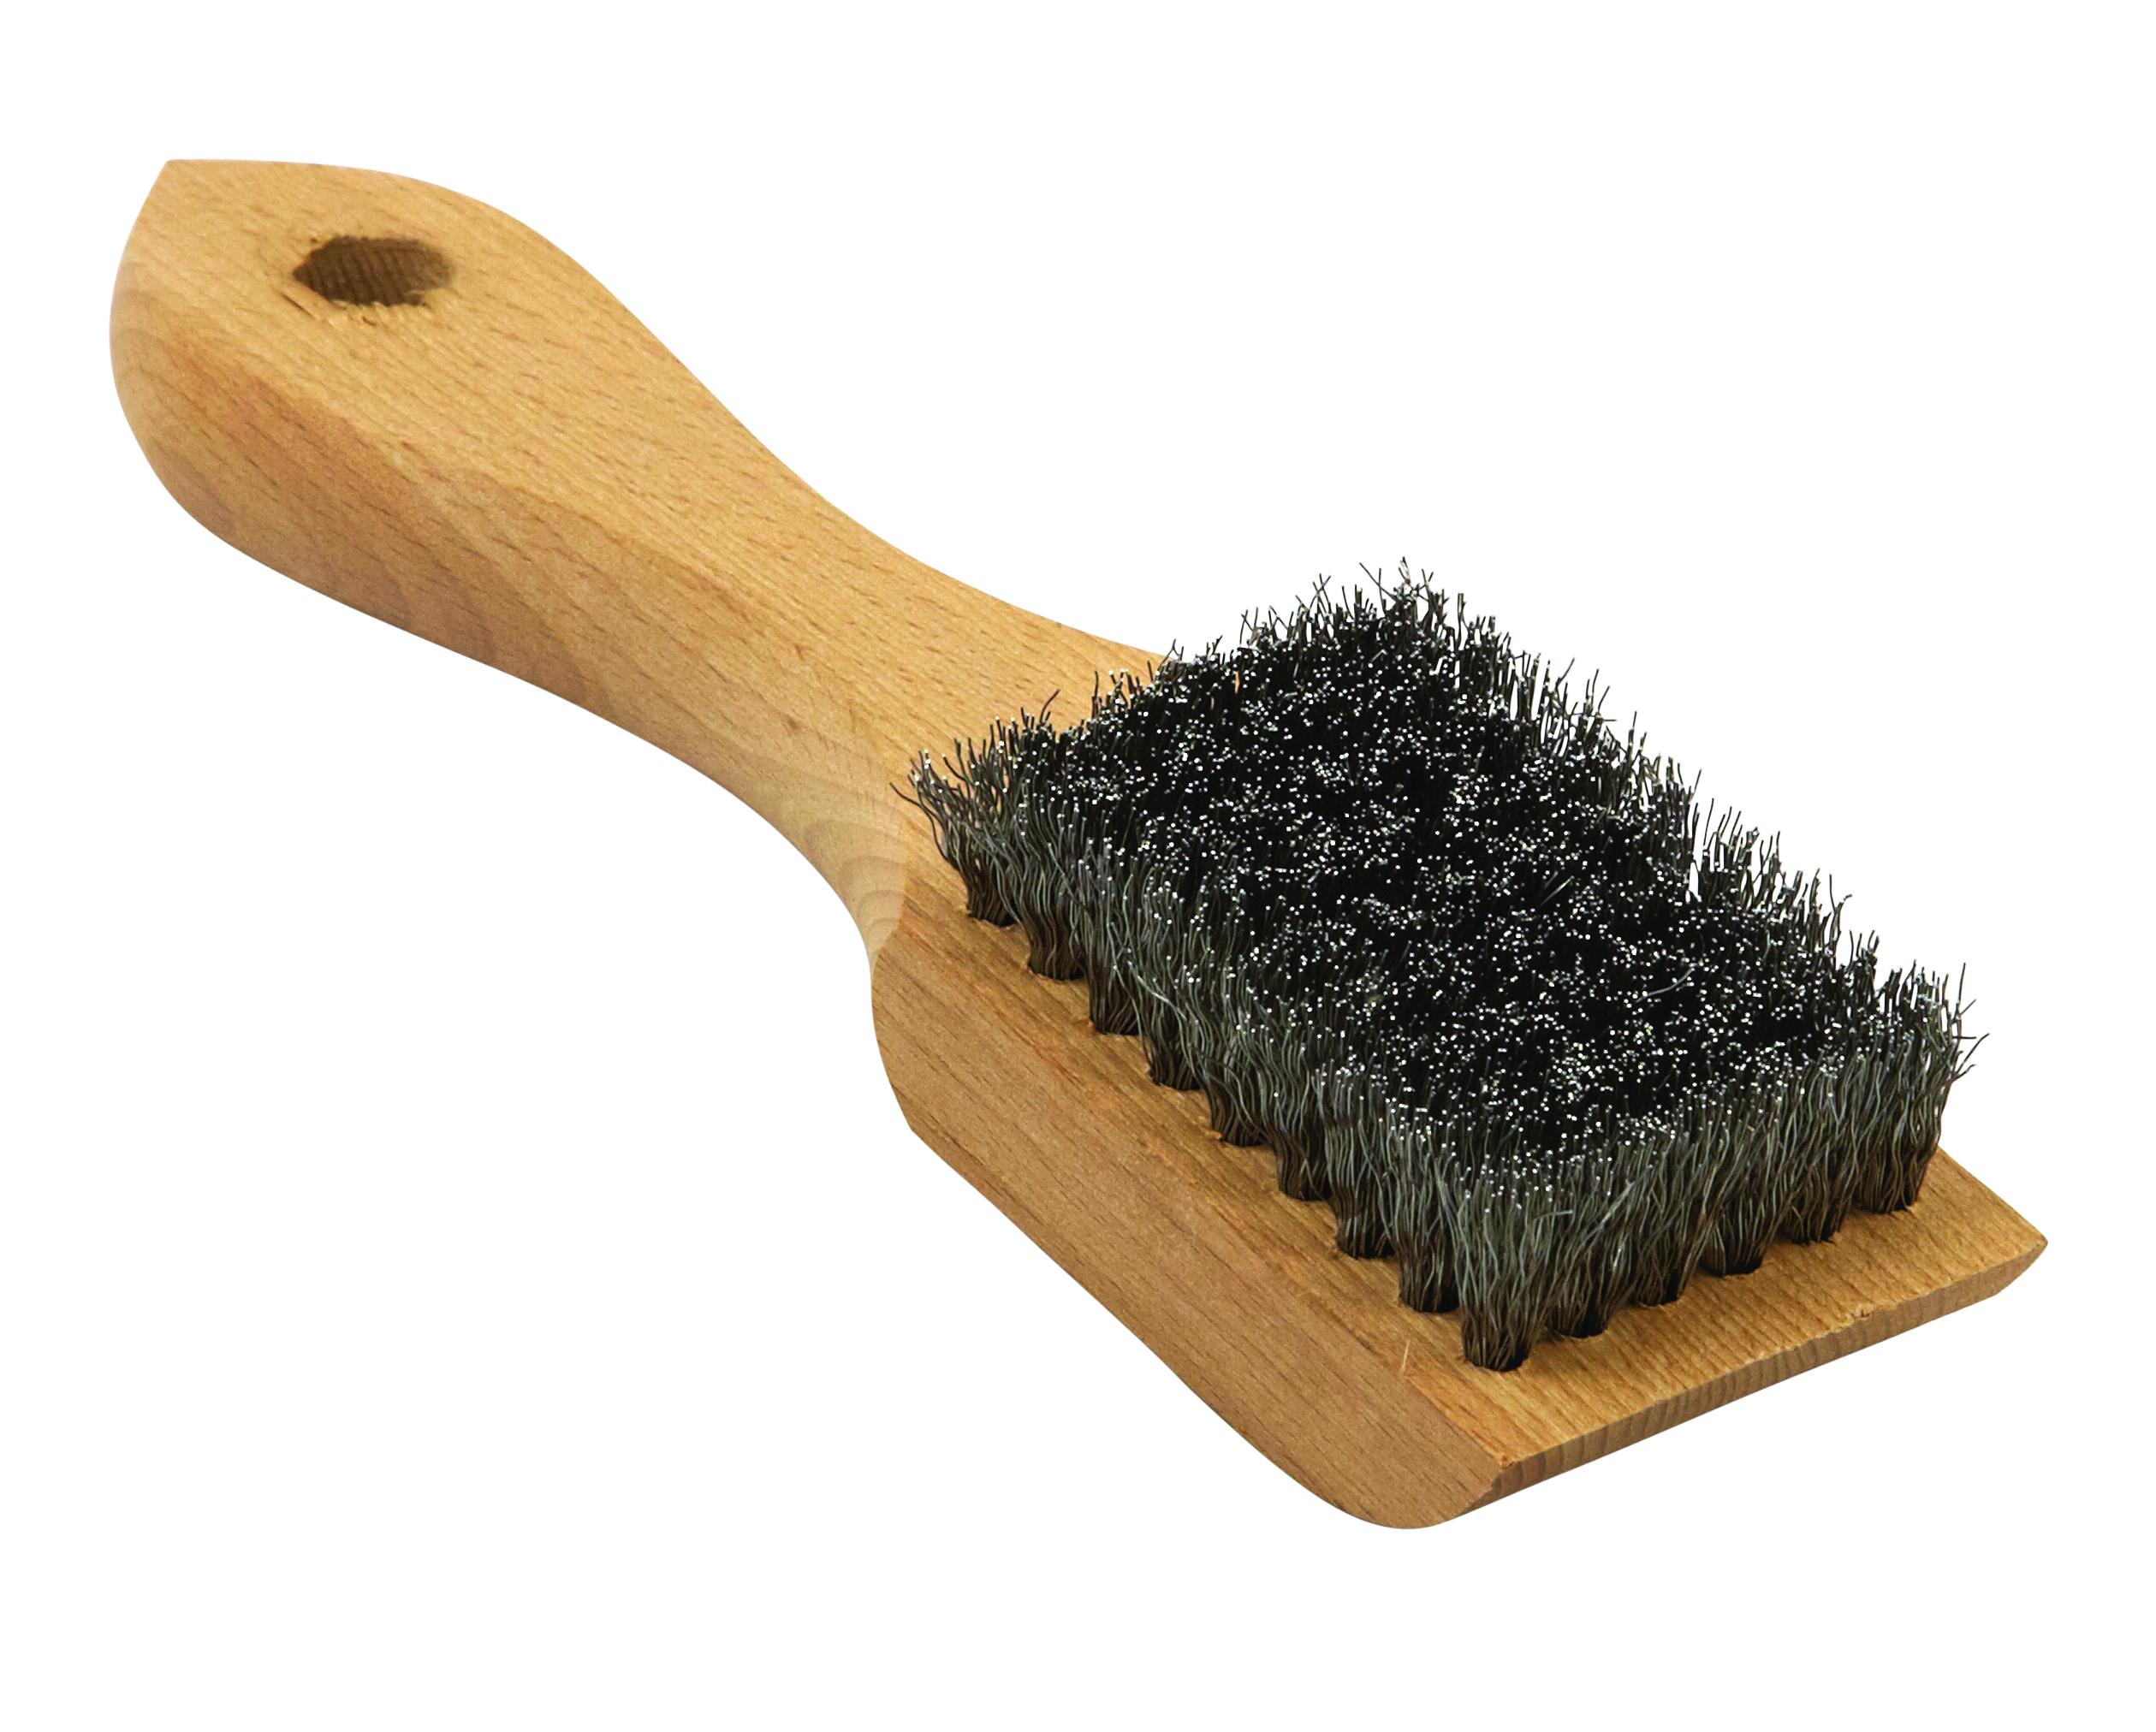 00501 Small Utility Brush